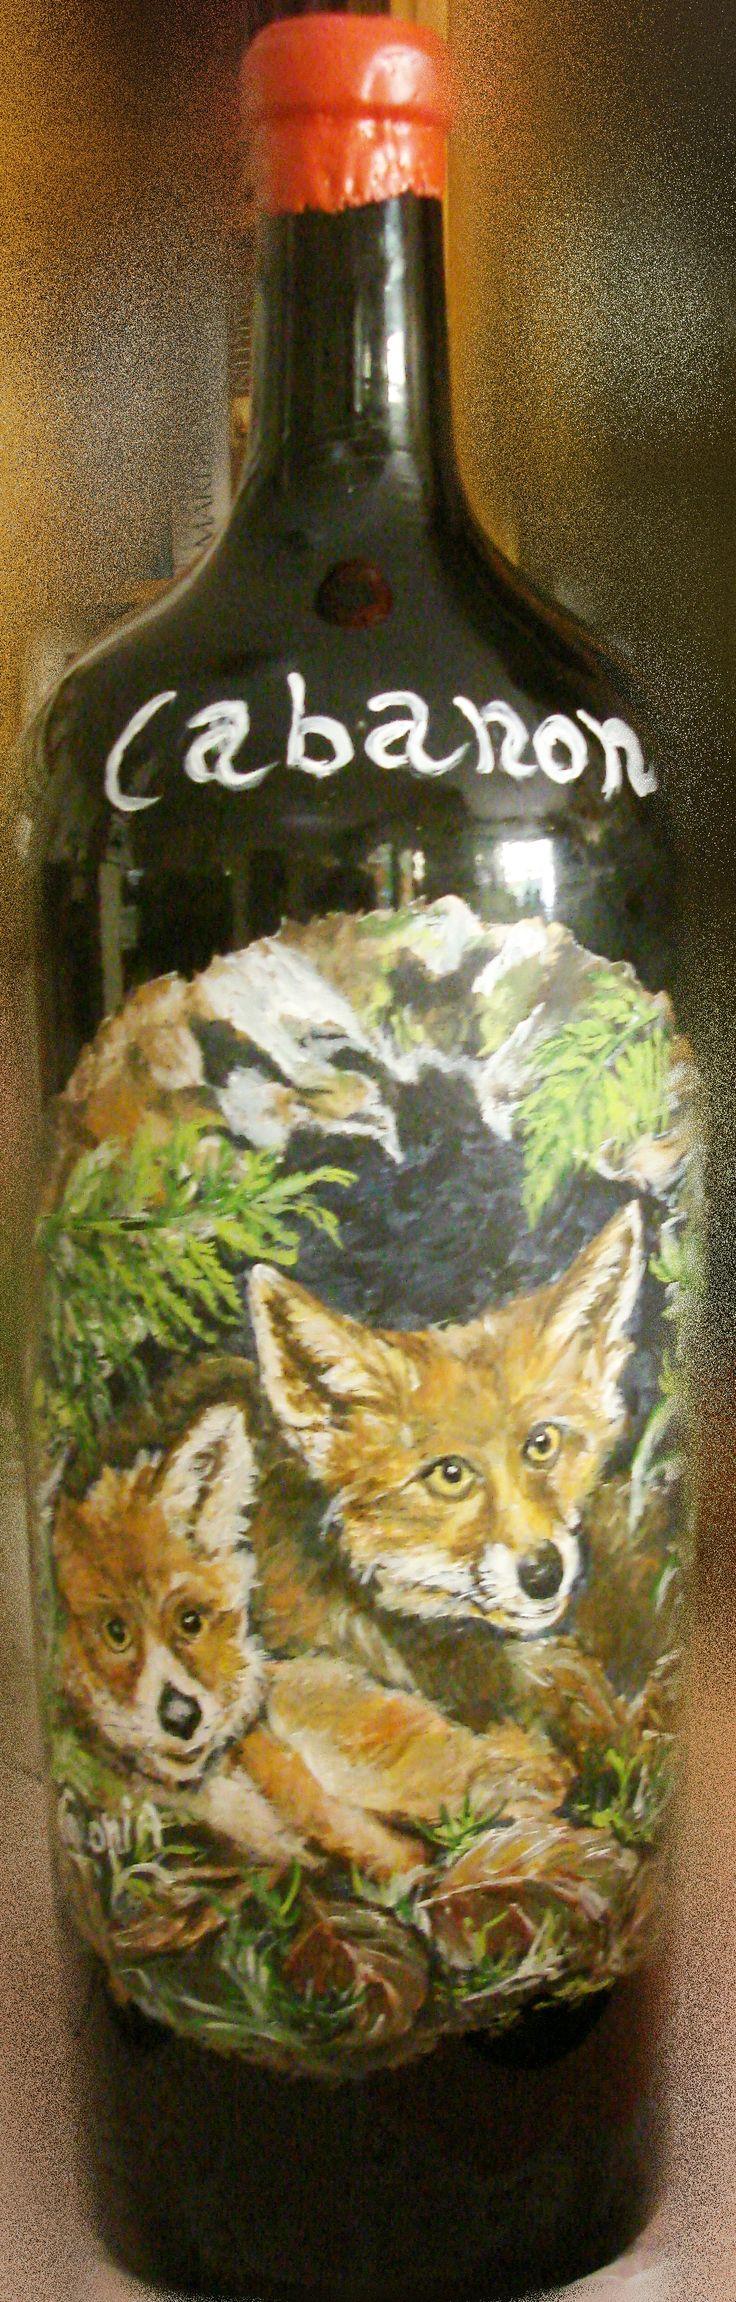 Painted for Art Vinique by Agnese Canopi. Wine: Cabernet Sauvignon by Fattoria Cabanon